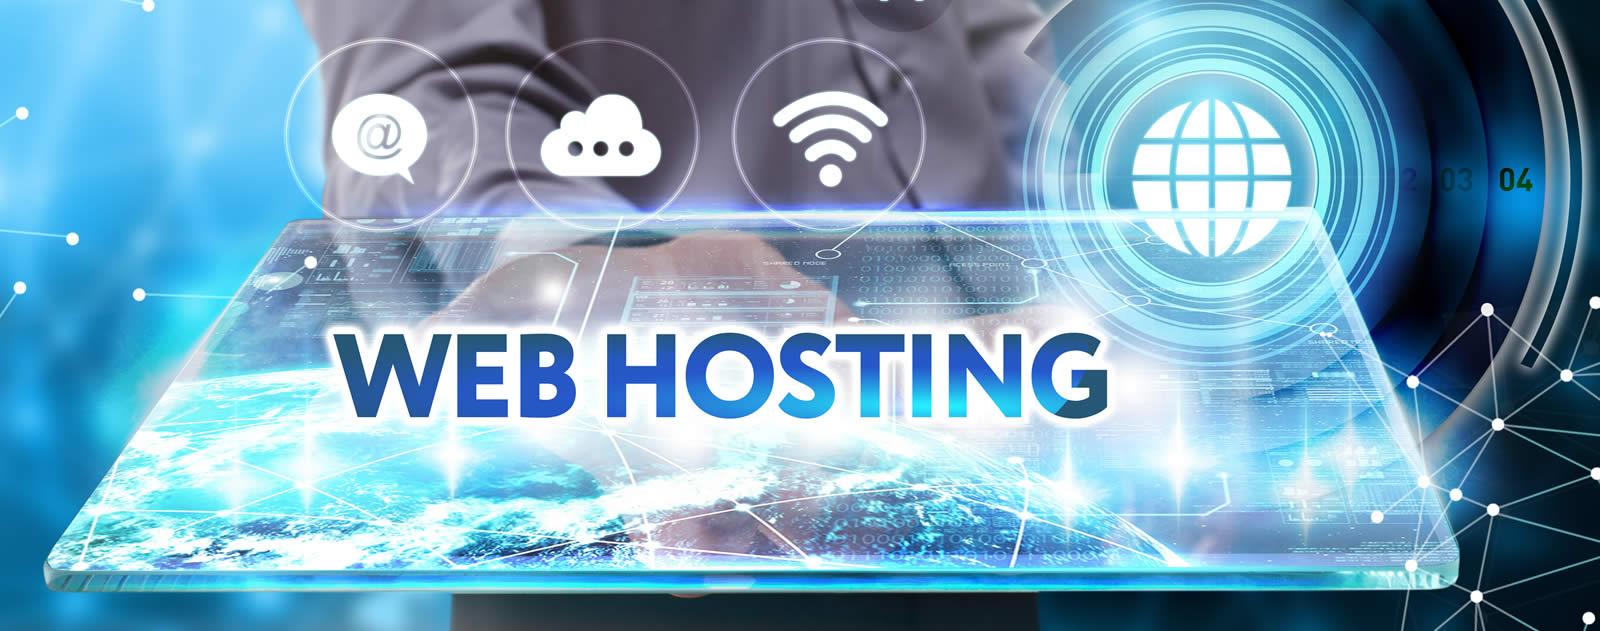 web hosting company in Pakistan